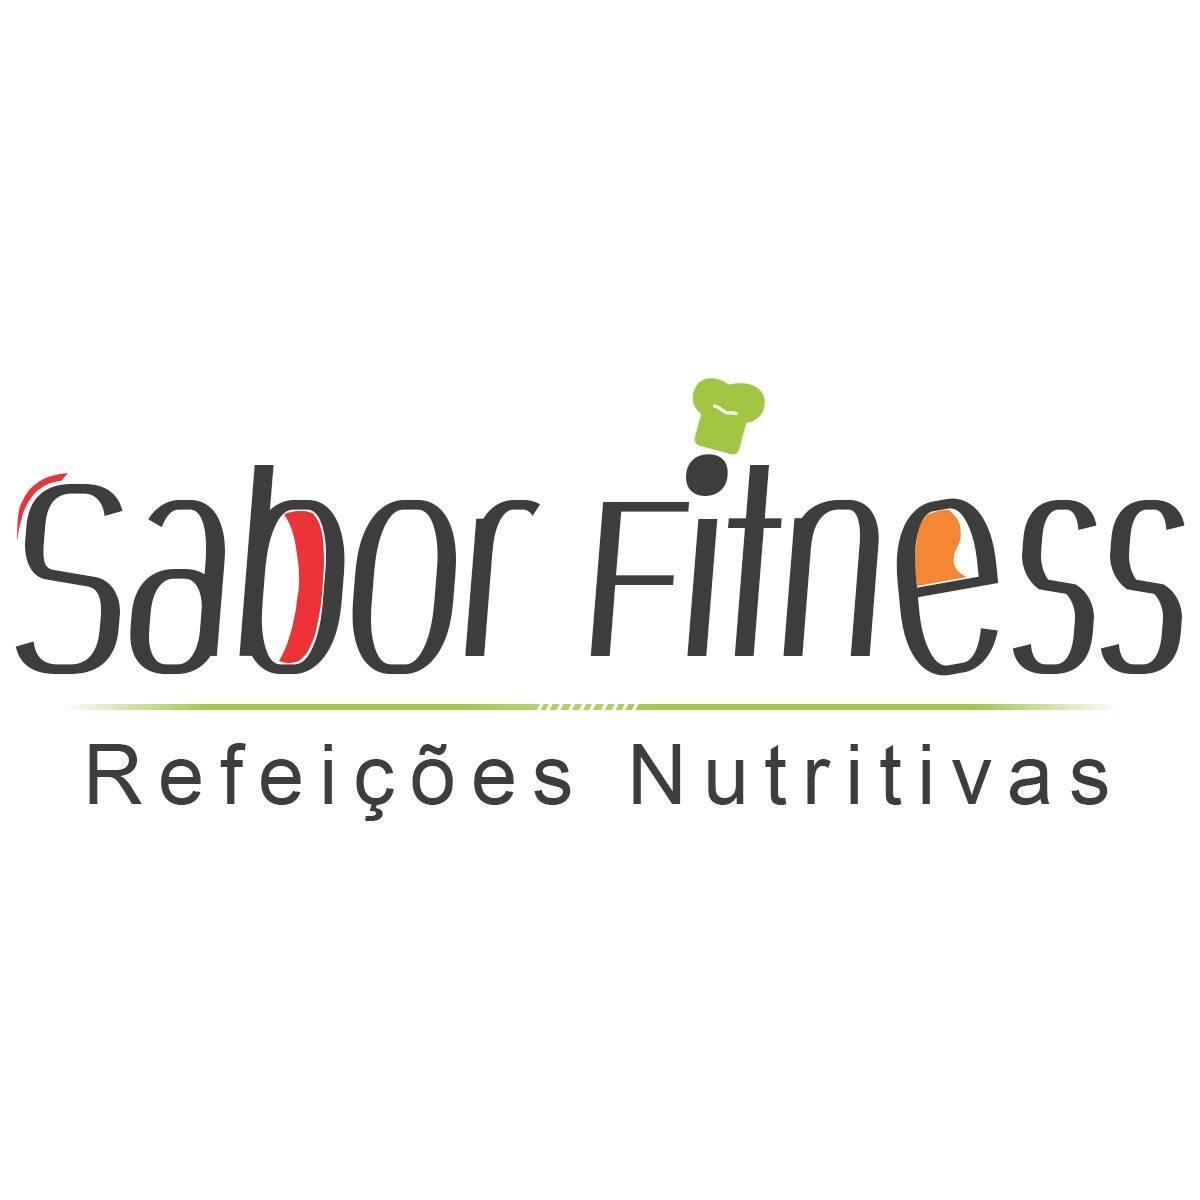 Sabor Fitness